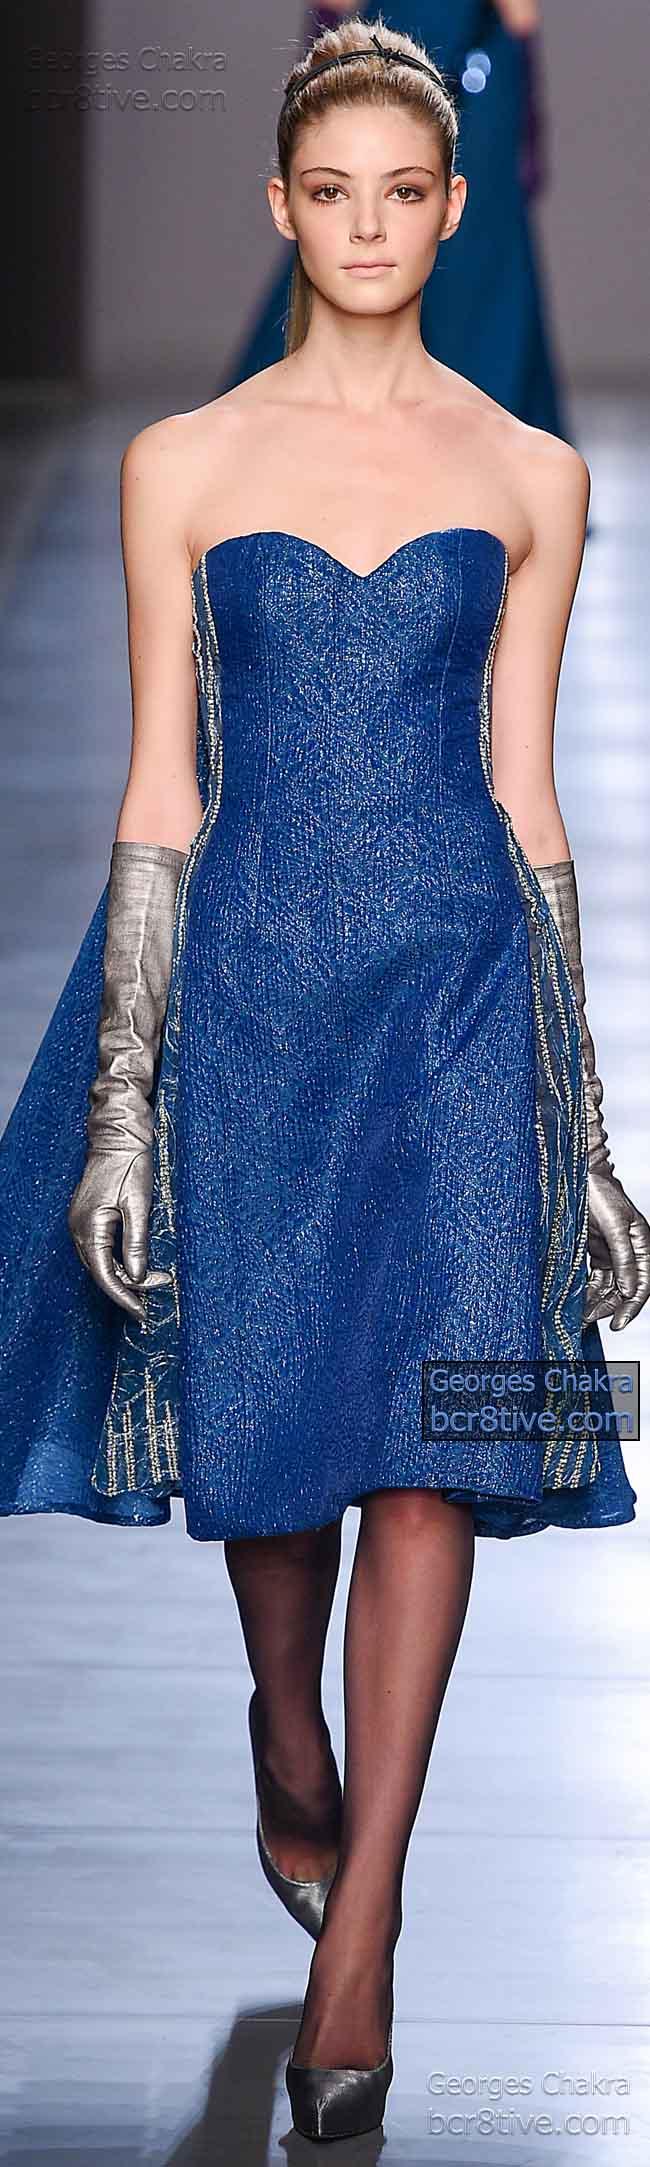 Debutante Style Blue